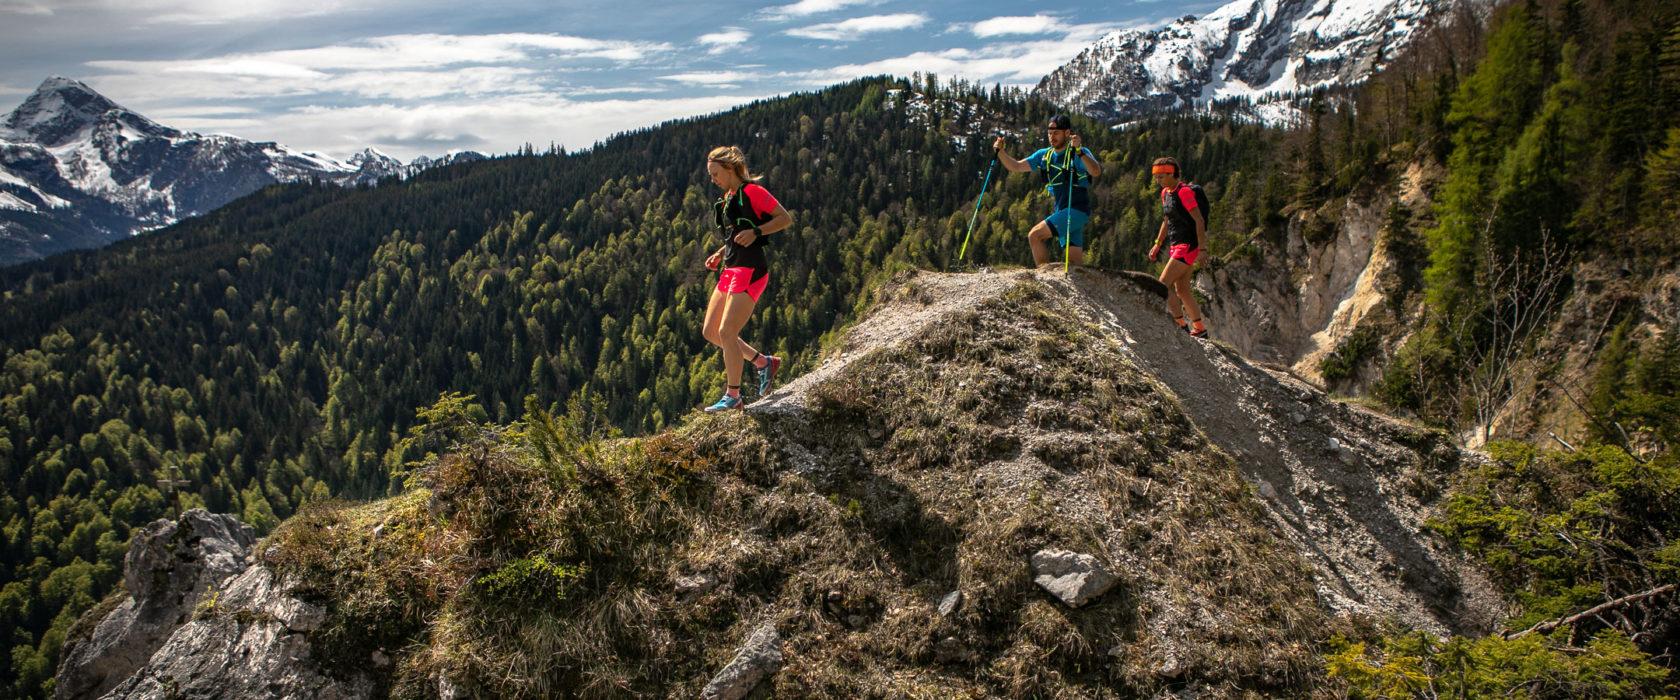 trailrunning-berggrat-ausruestung